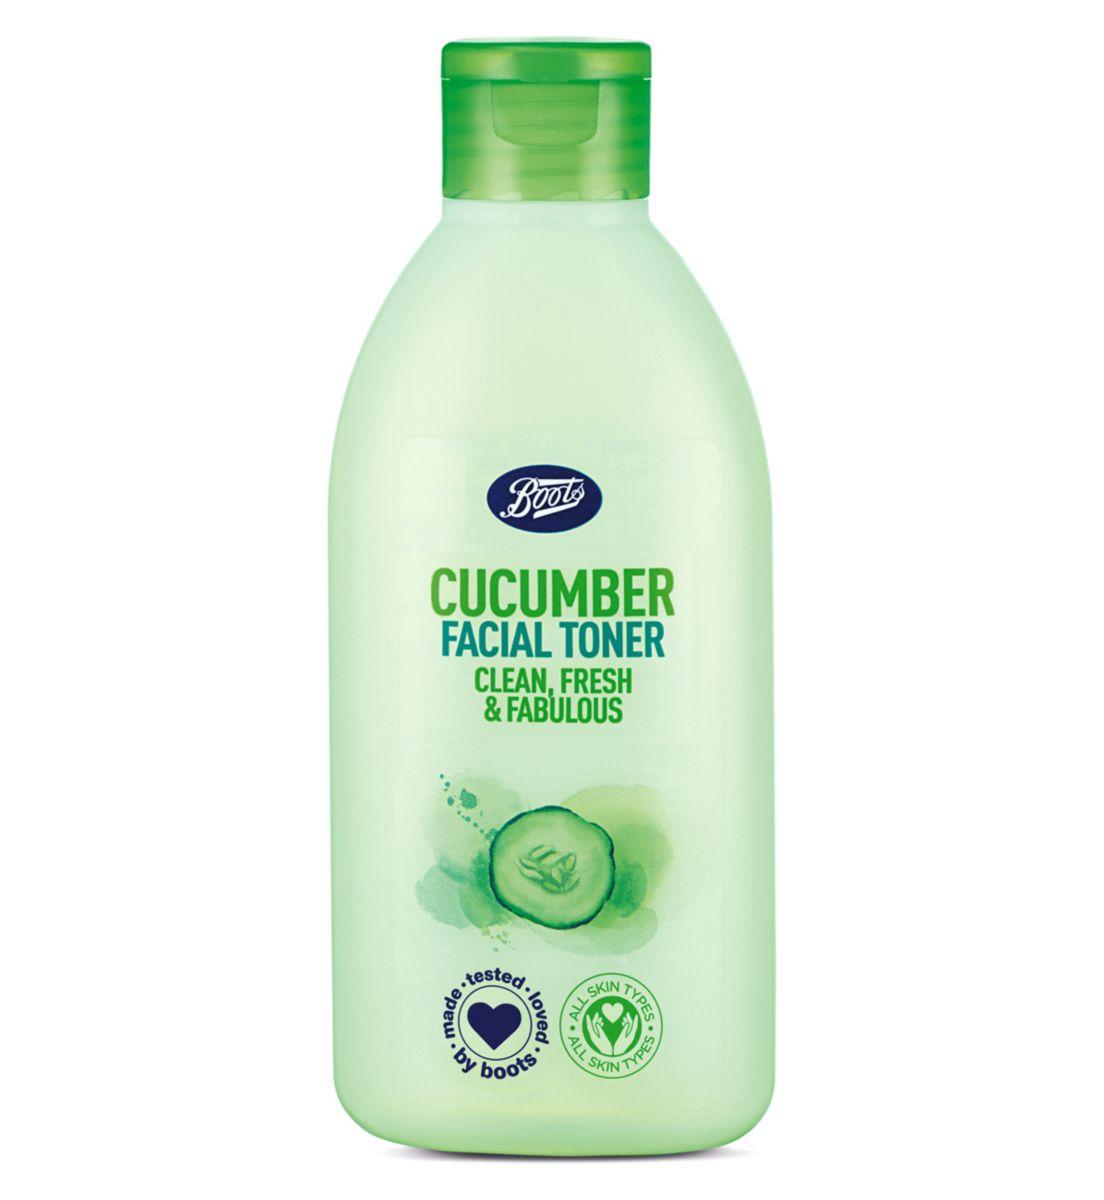 Boots Cucumber Facial Toner บู๊ทส์ คิวคัมเบอร์ เฟเชี่ยล โทนเนอร์ (150 Ml) สินค้าของแท้จากช็อป.